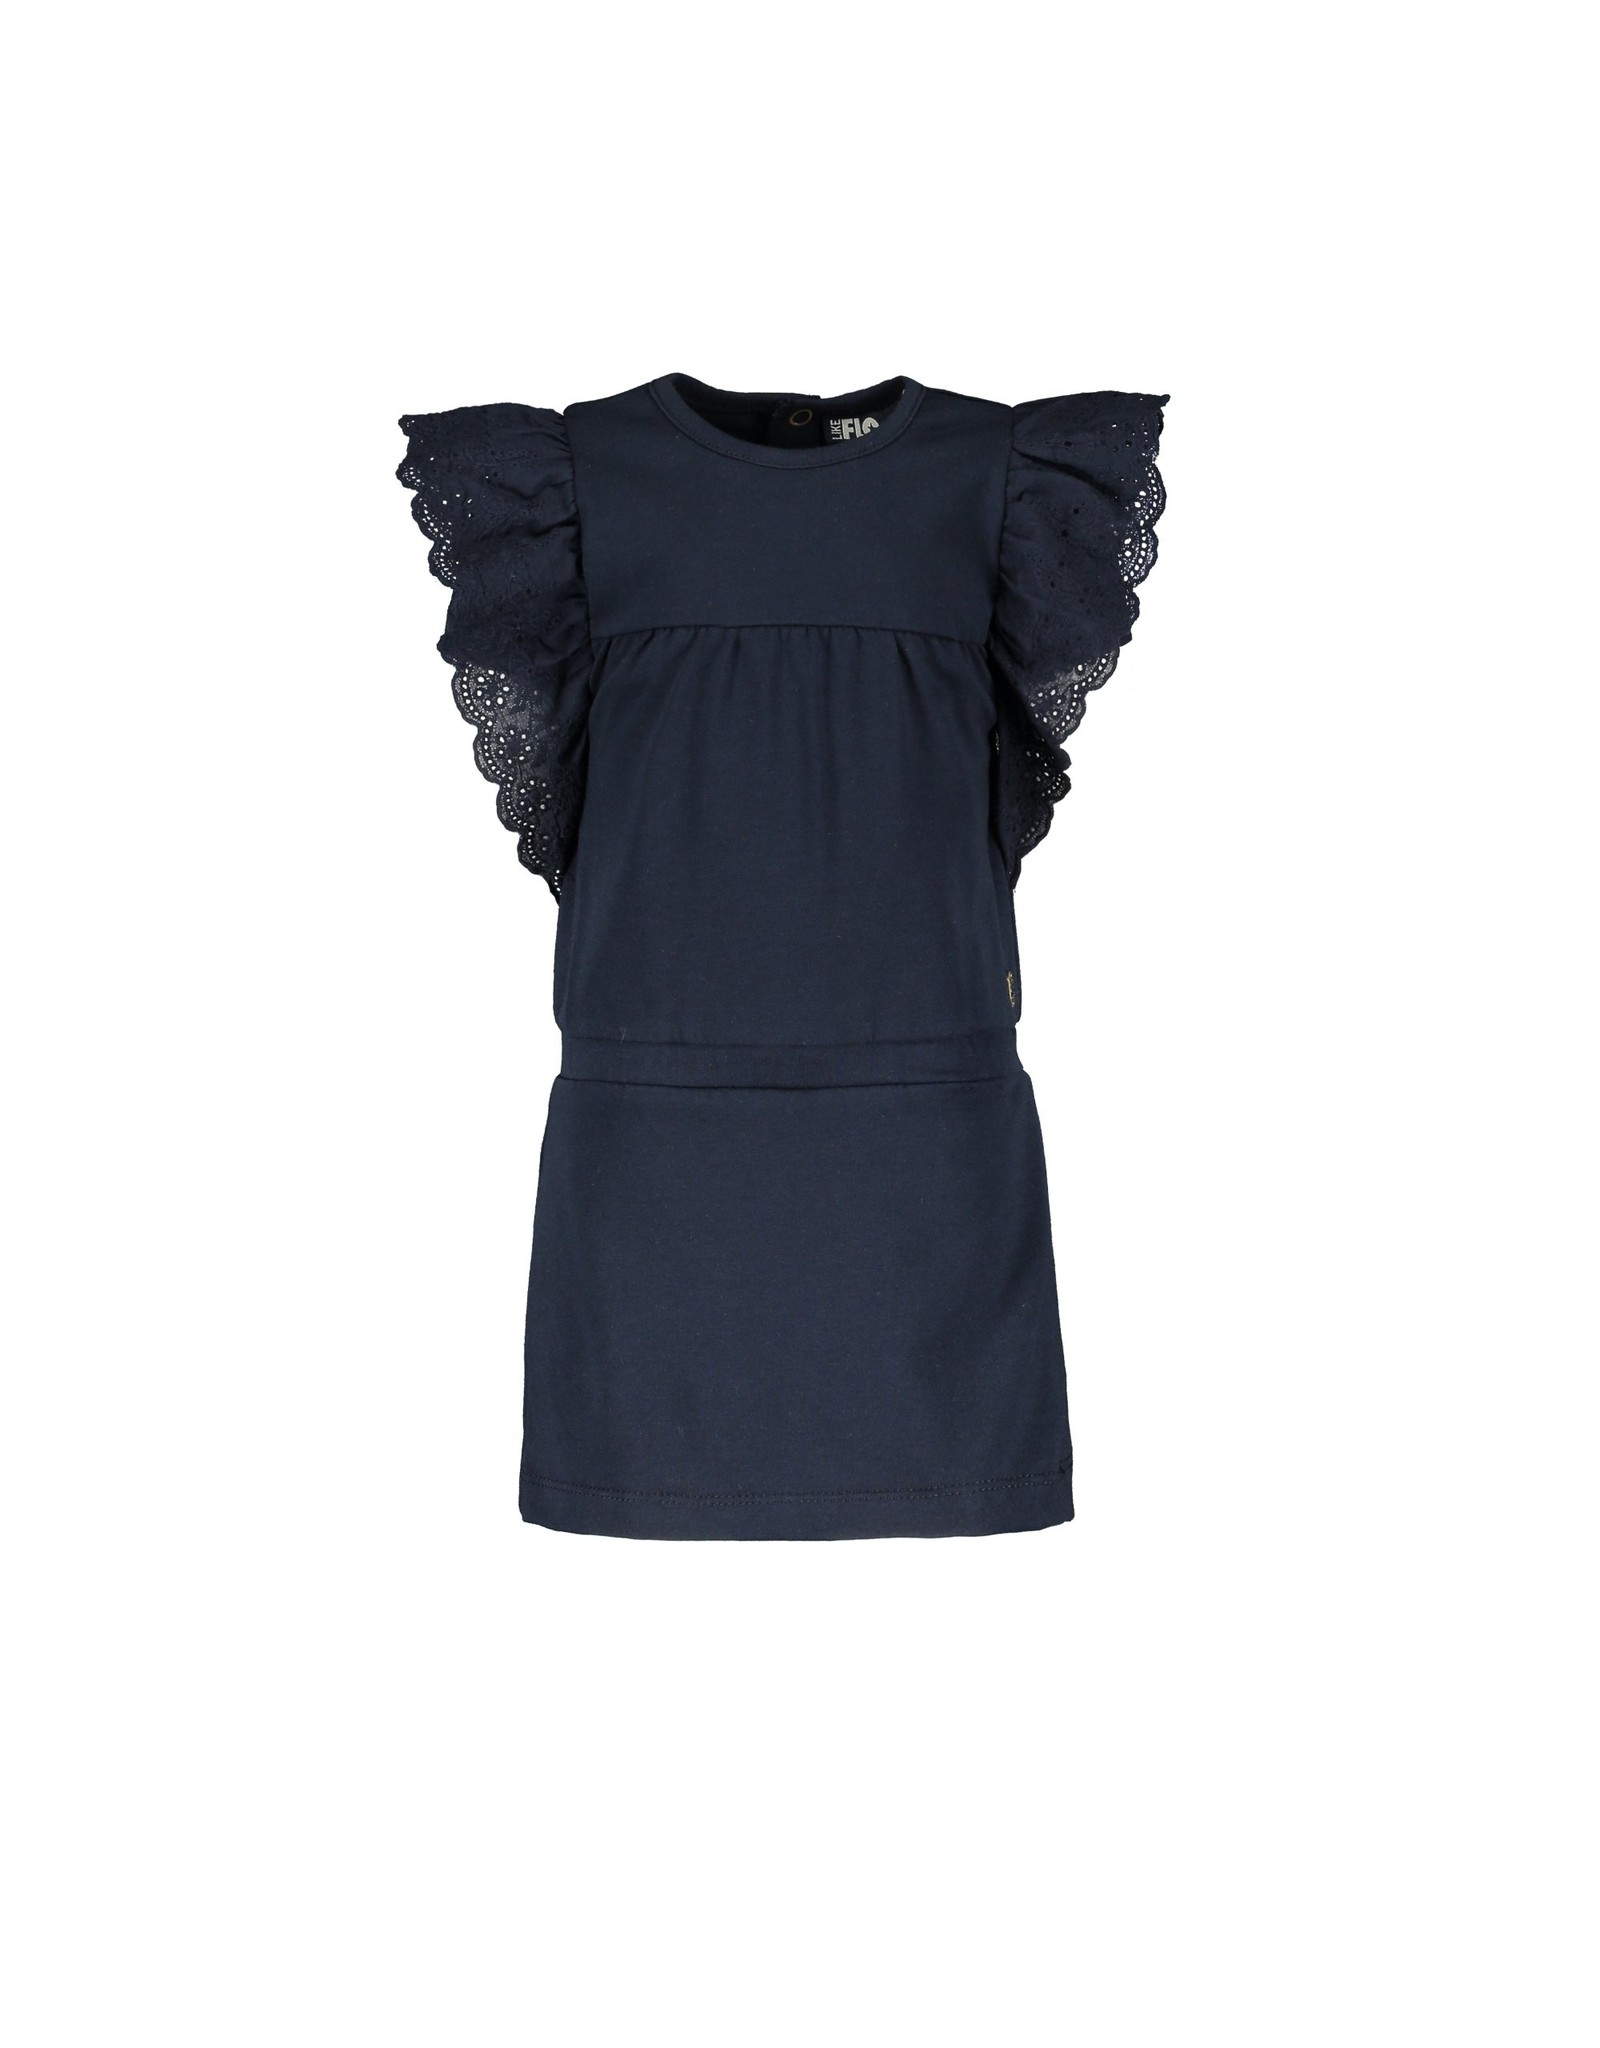 Like Flo baby girls jersey broidery anglais dress Navy Blue